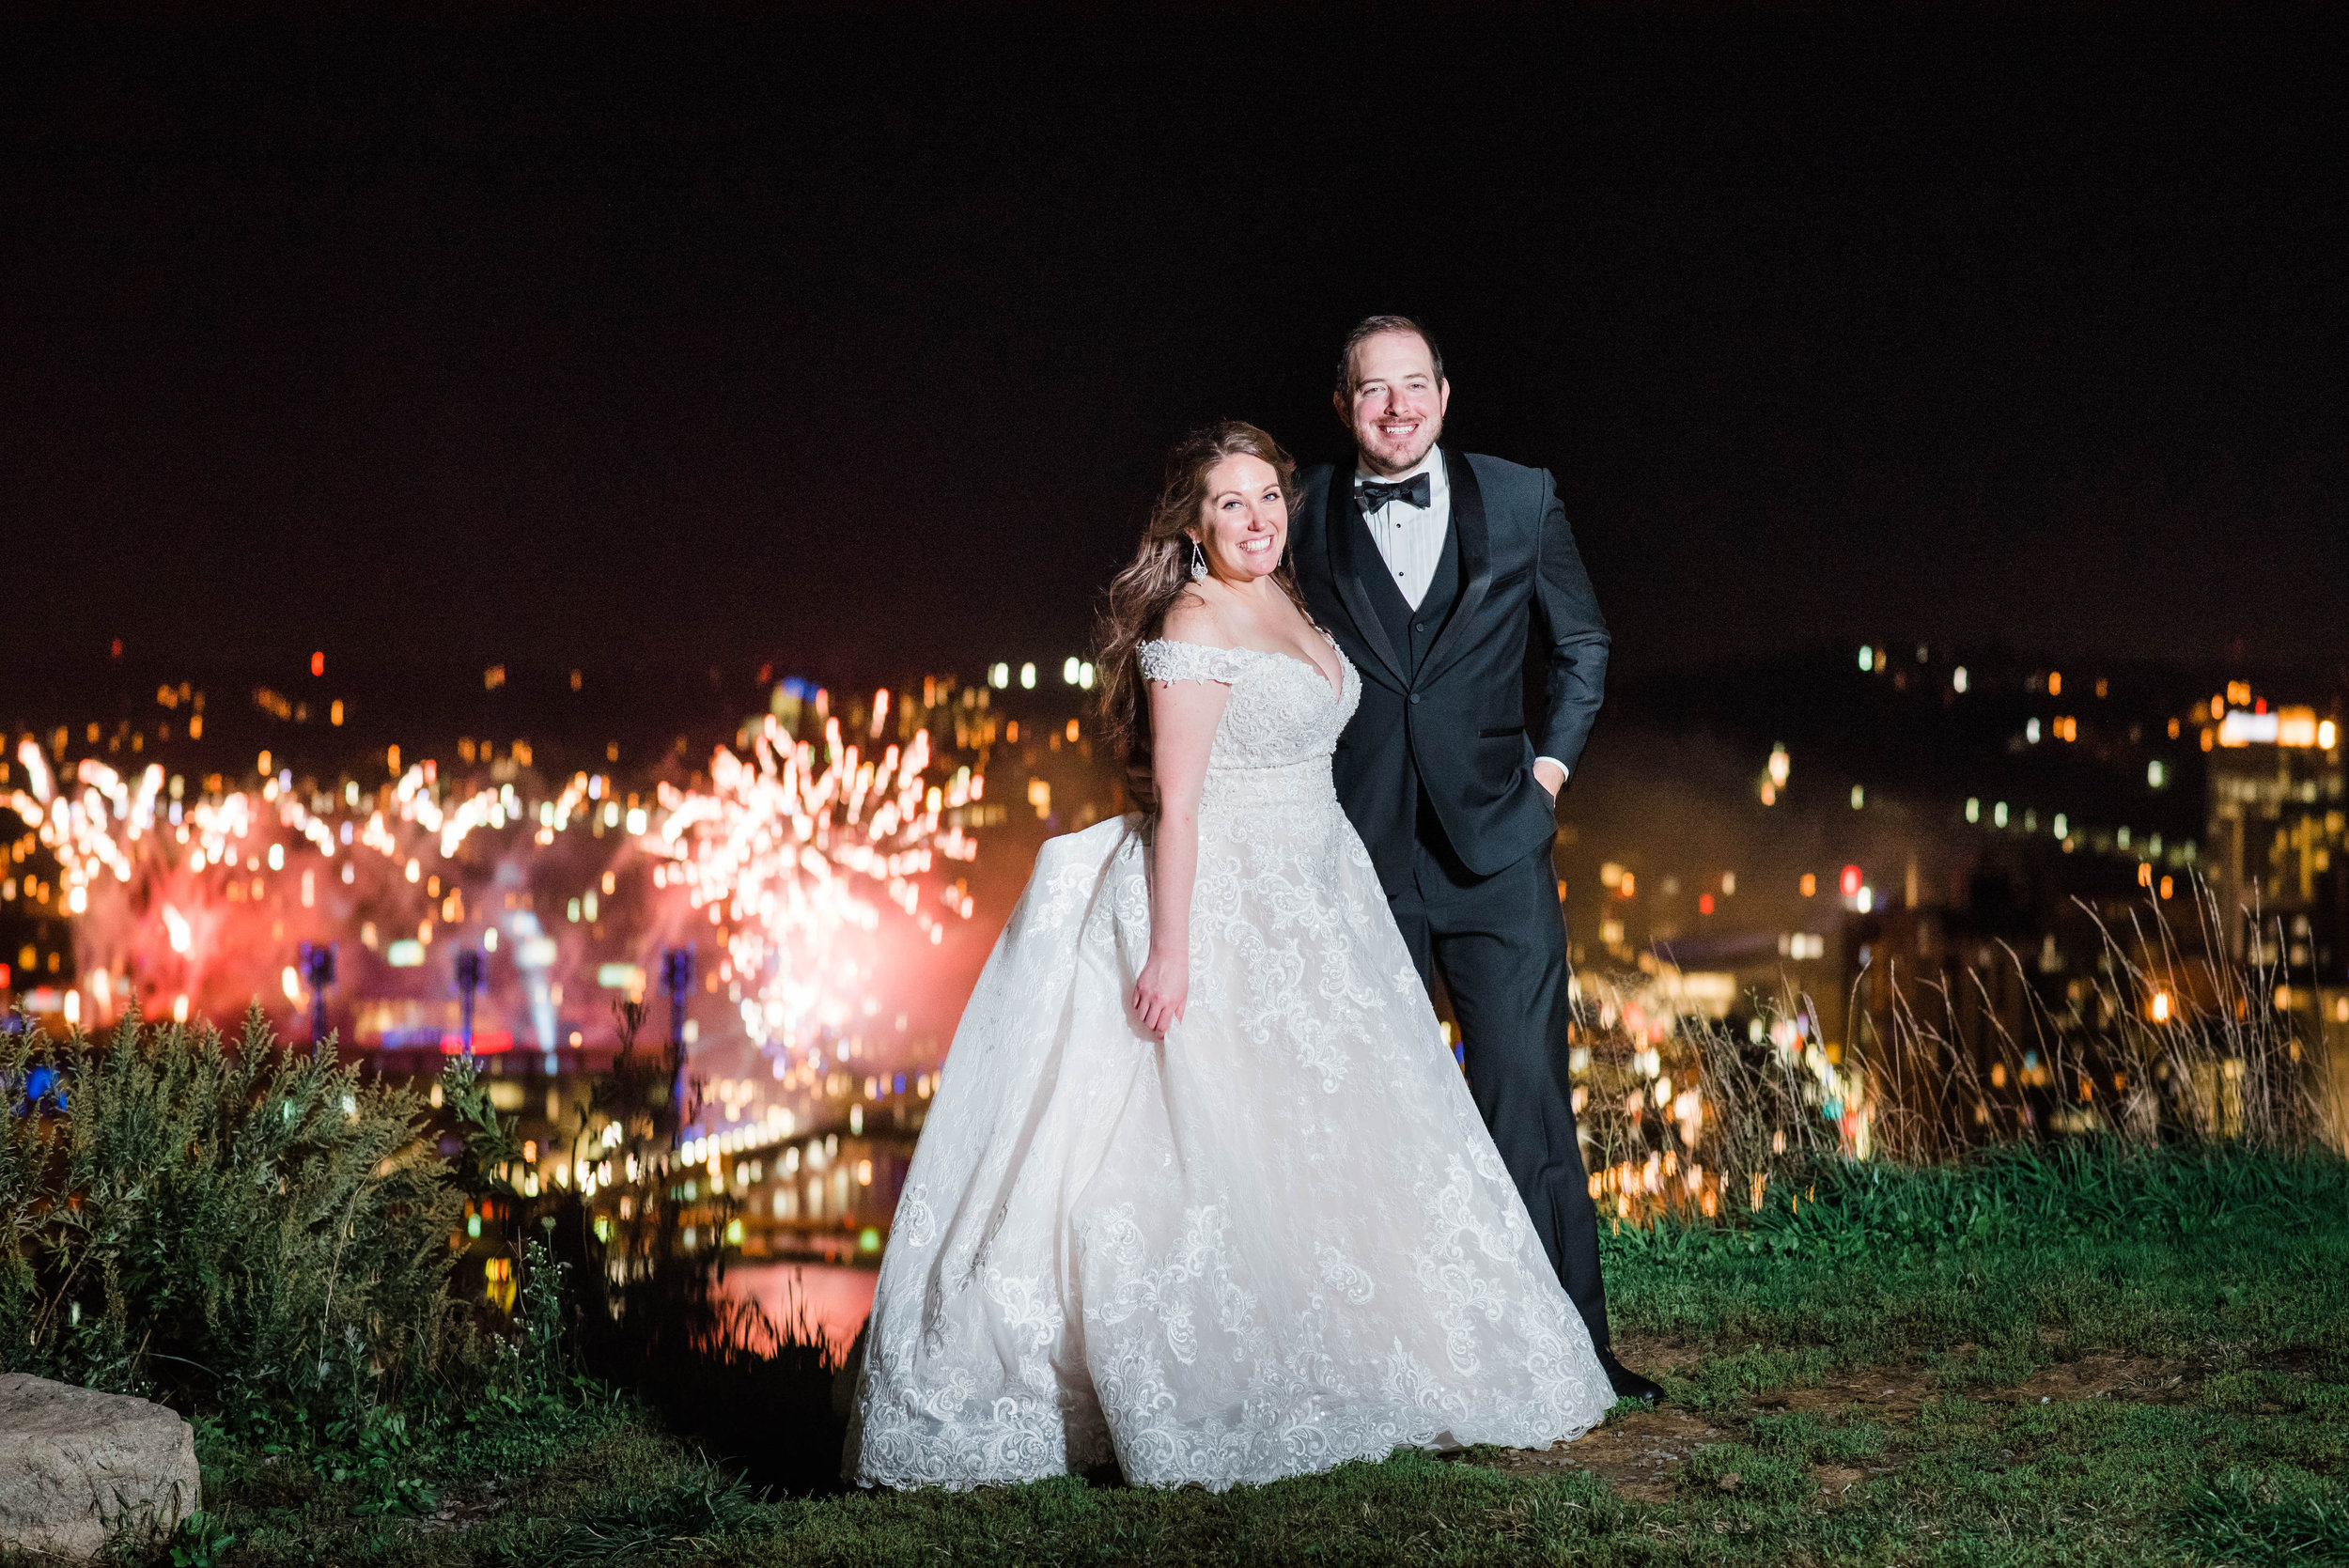 Ashleigh and Adam Wedding 9 28 18-Bride Groom-0178.jpg